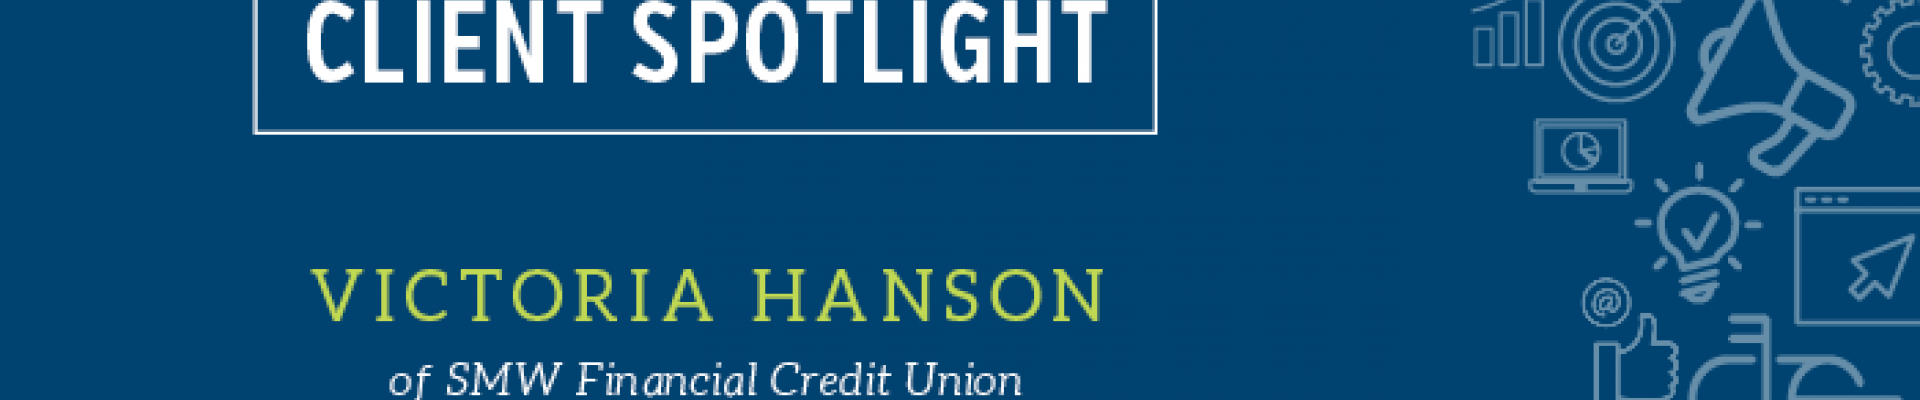 Client Spotlight - Victoria Hanson at SMW Financial Credit Union